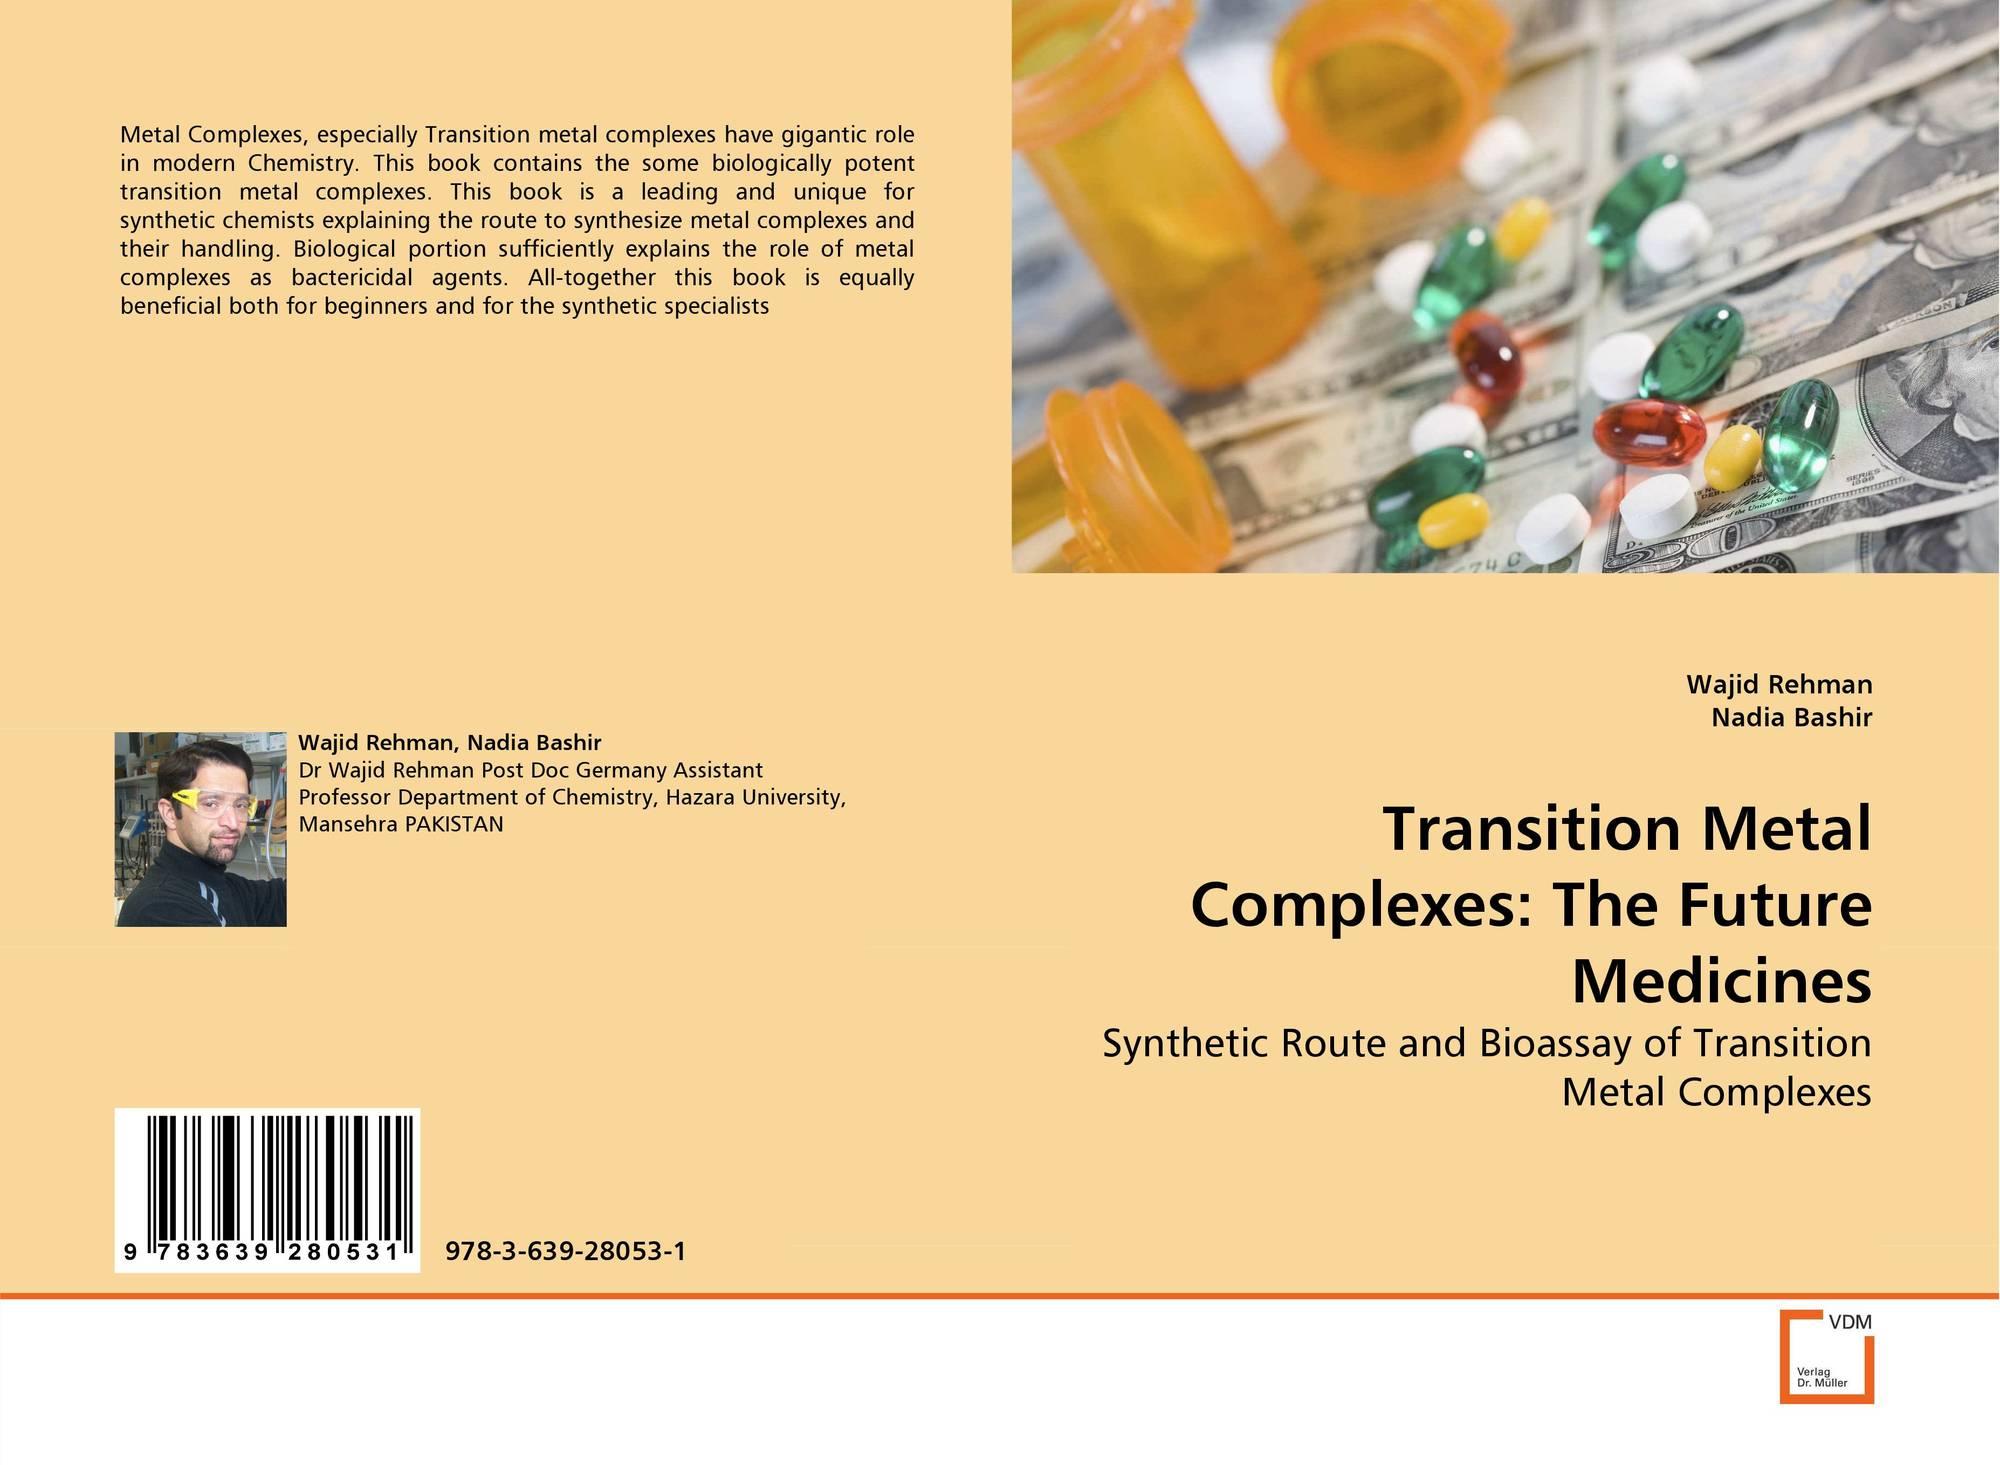 transition metal complexes in medicine